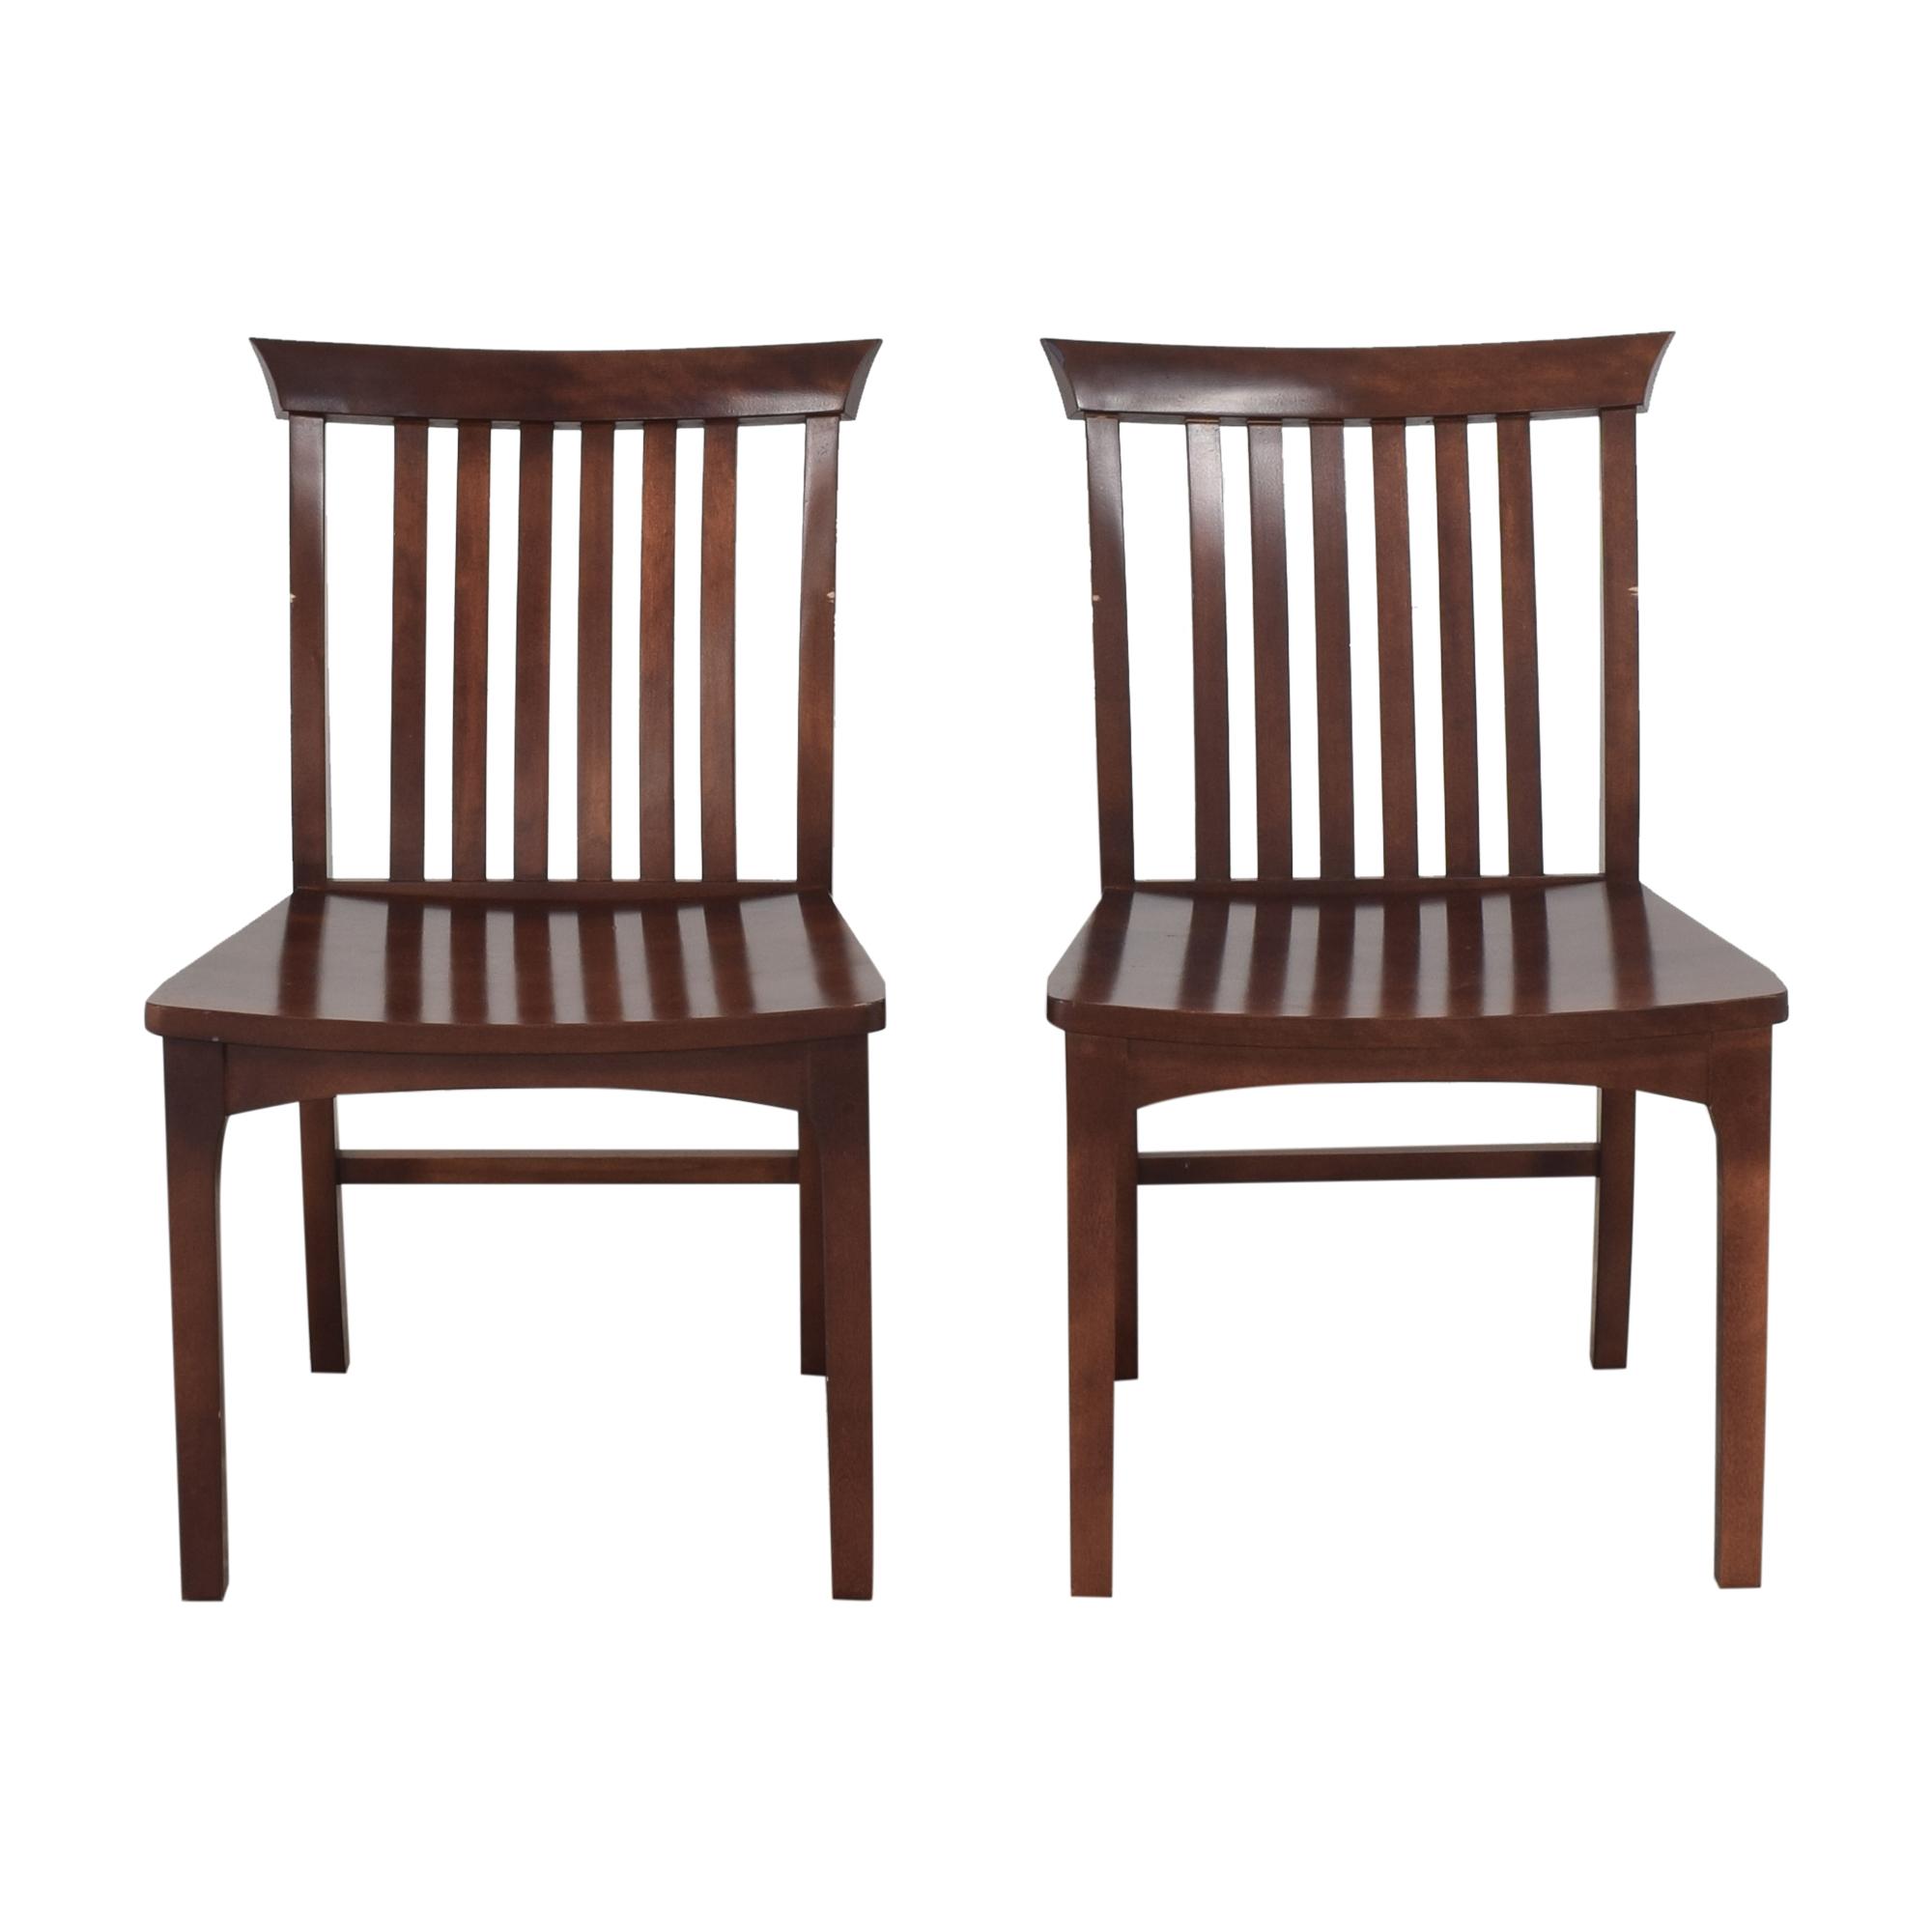 buy Pompanoosuc Mills Goddard Dining Side Chairs Pompanoosuc Mills Dining Chairs